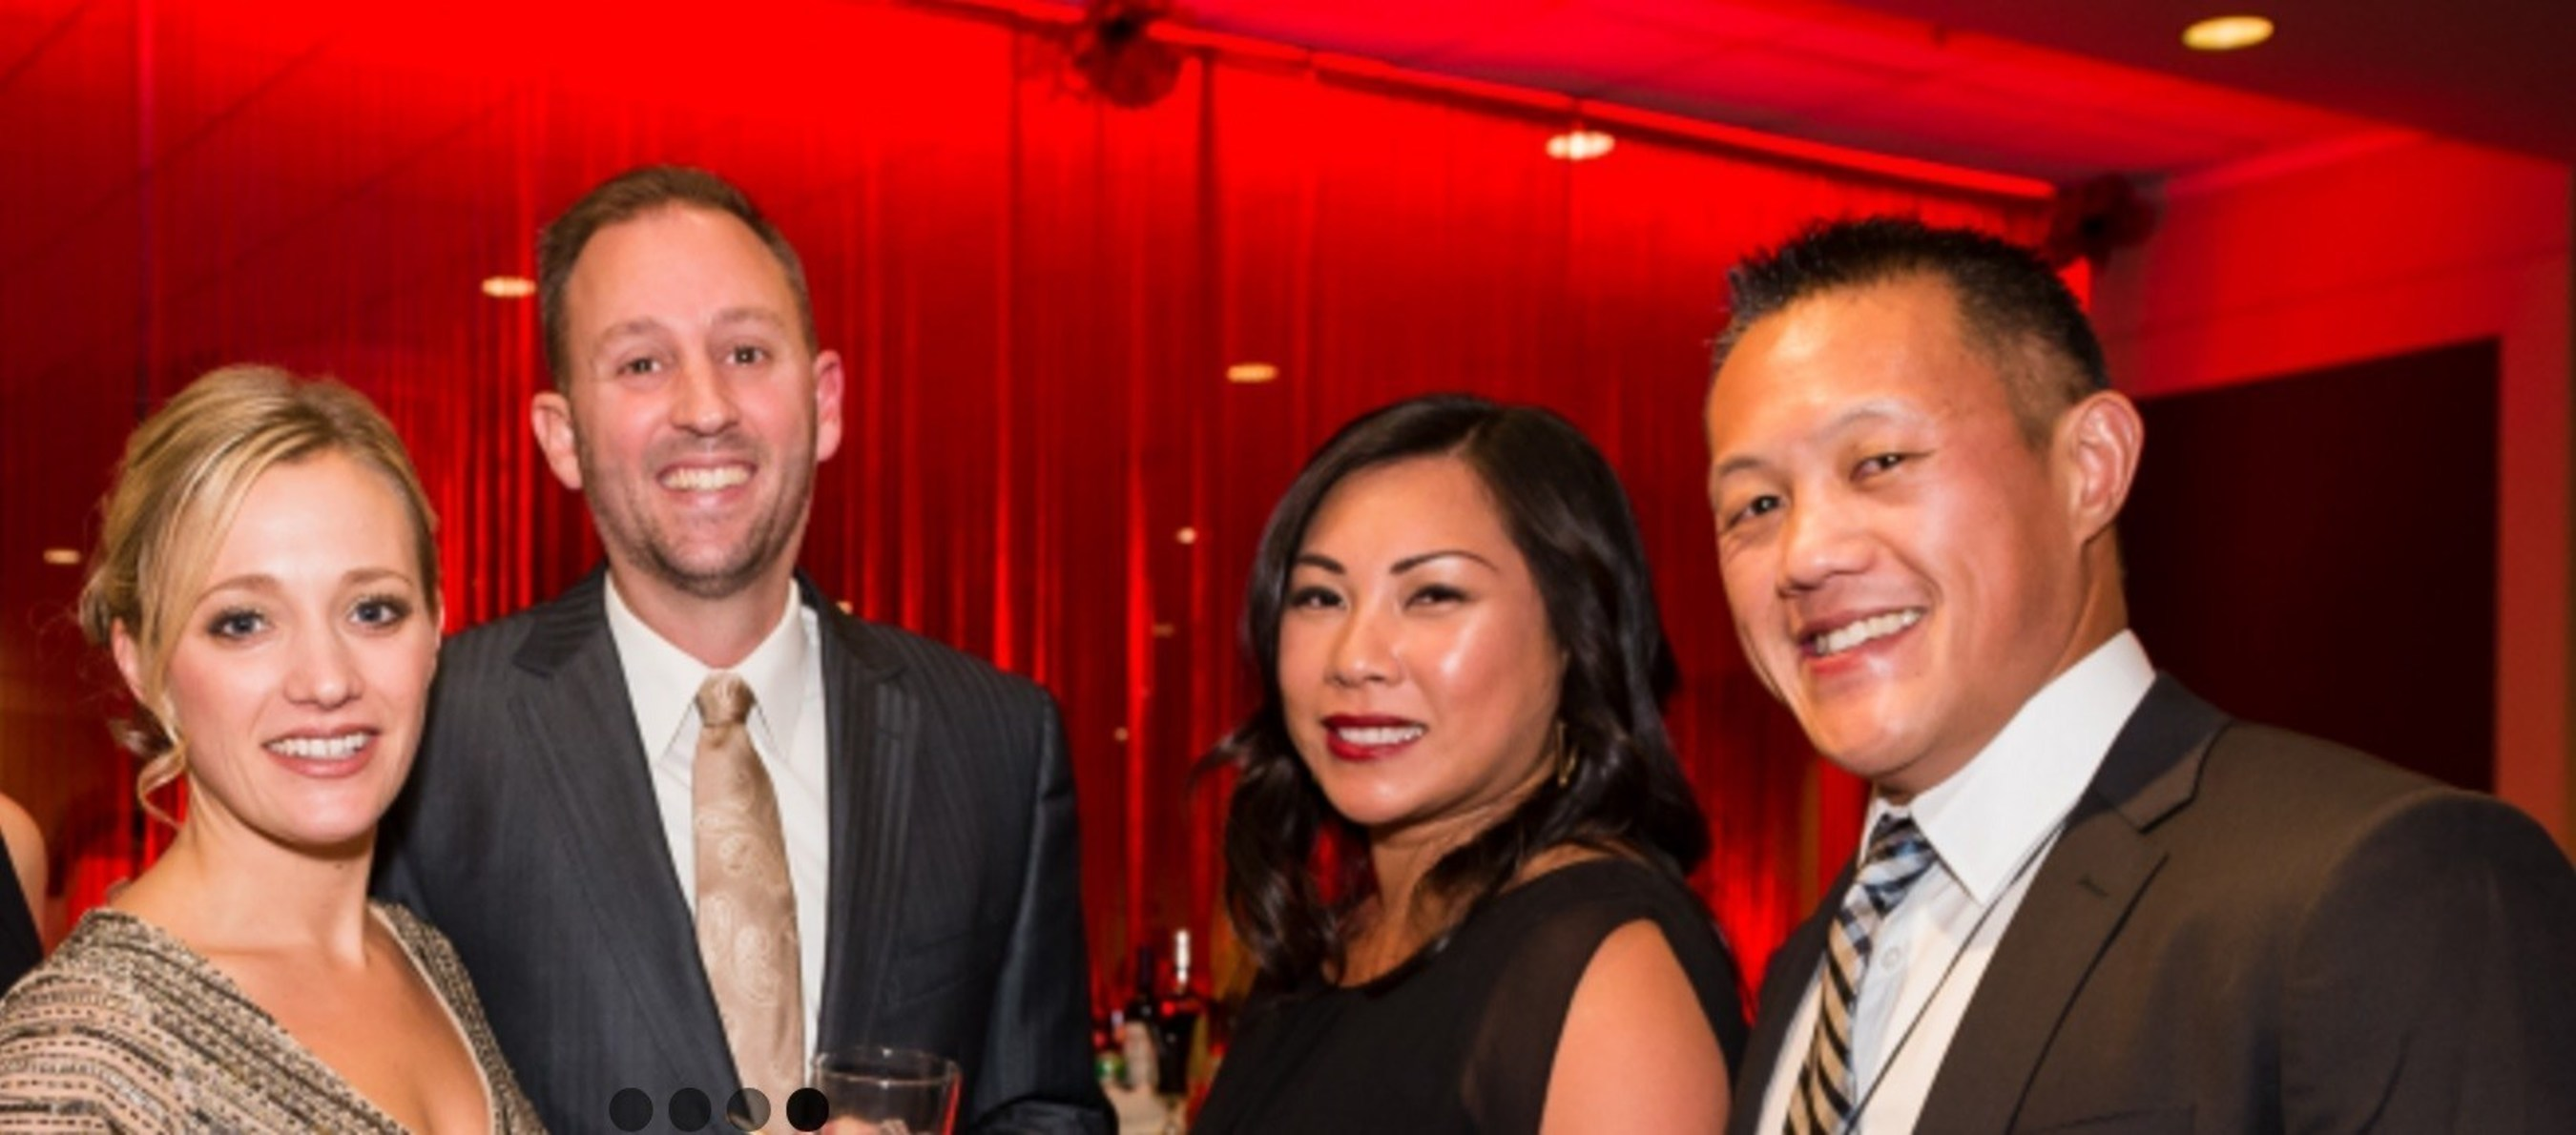 Viridian Investments (Pictured:  Erica Dusenbury, Marcus Dusenbury, Holly Tam, and Adriel Tam)